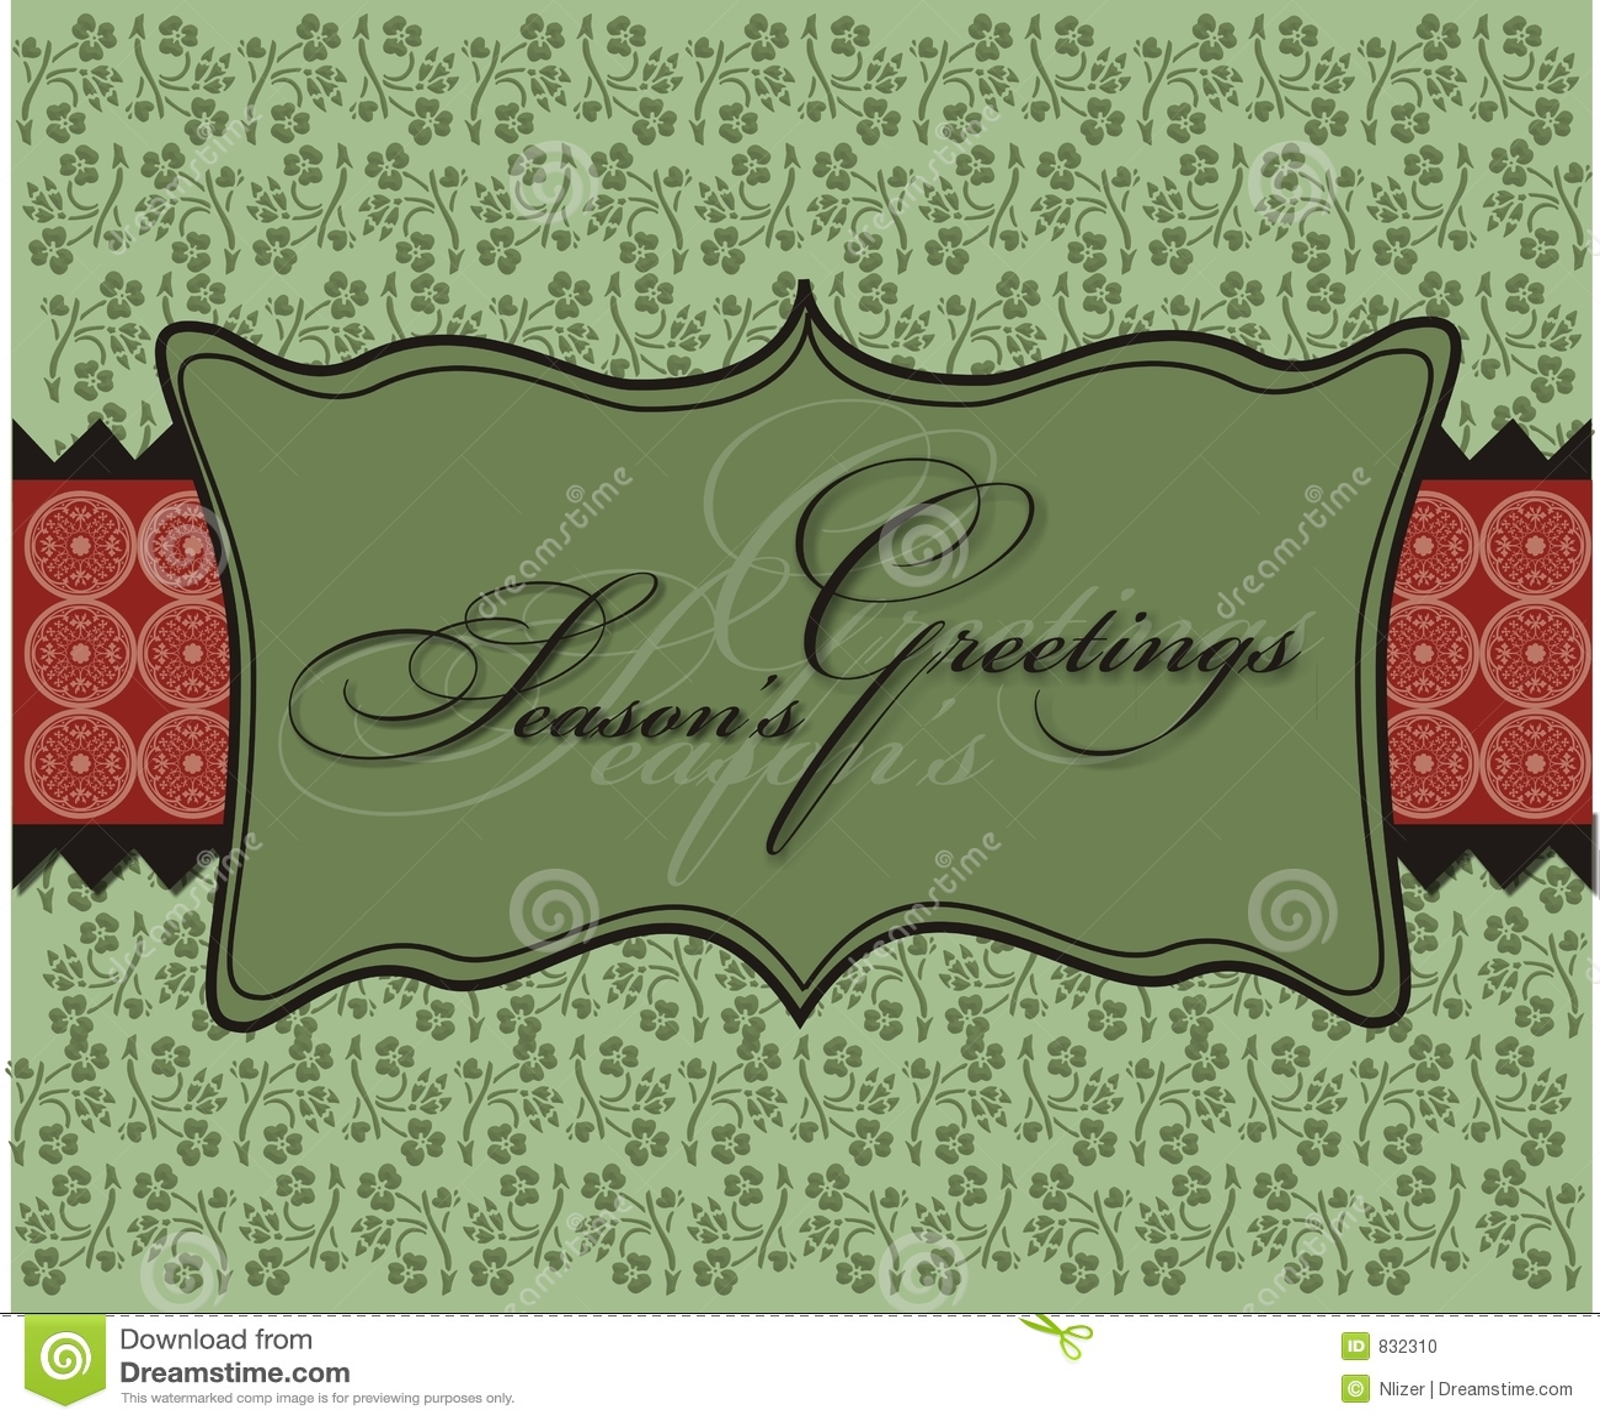 Christmas seasons greetings background wallpaper stock illustration download christmas seasons greetings background wallpaper stock illustration illustration of design drawing 832310 m4hsunfo